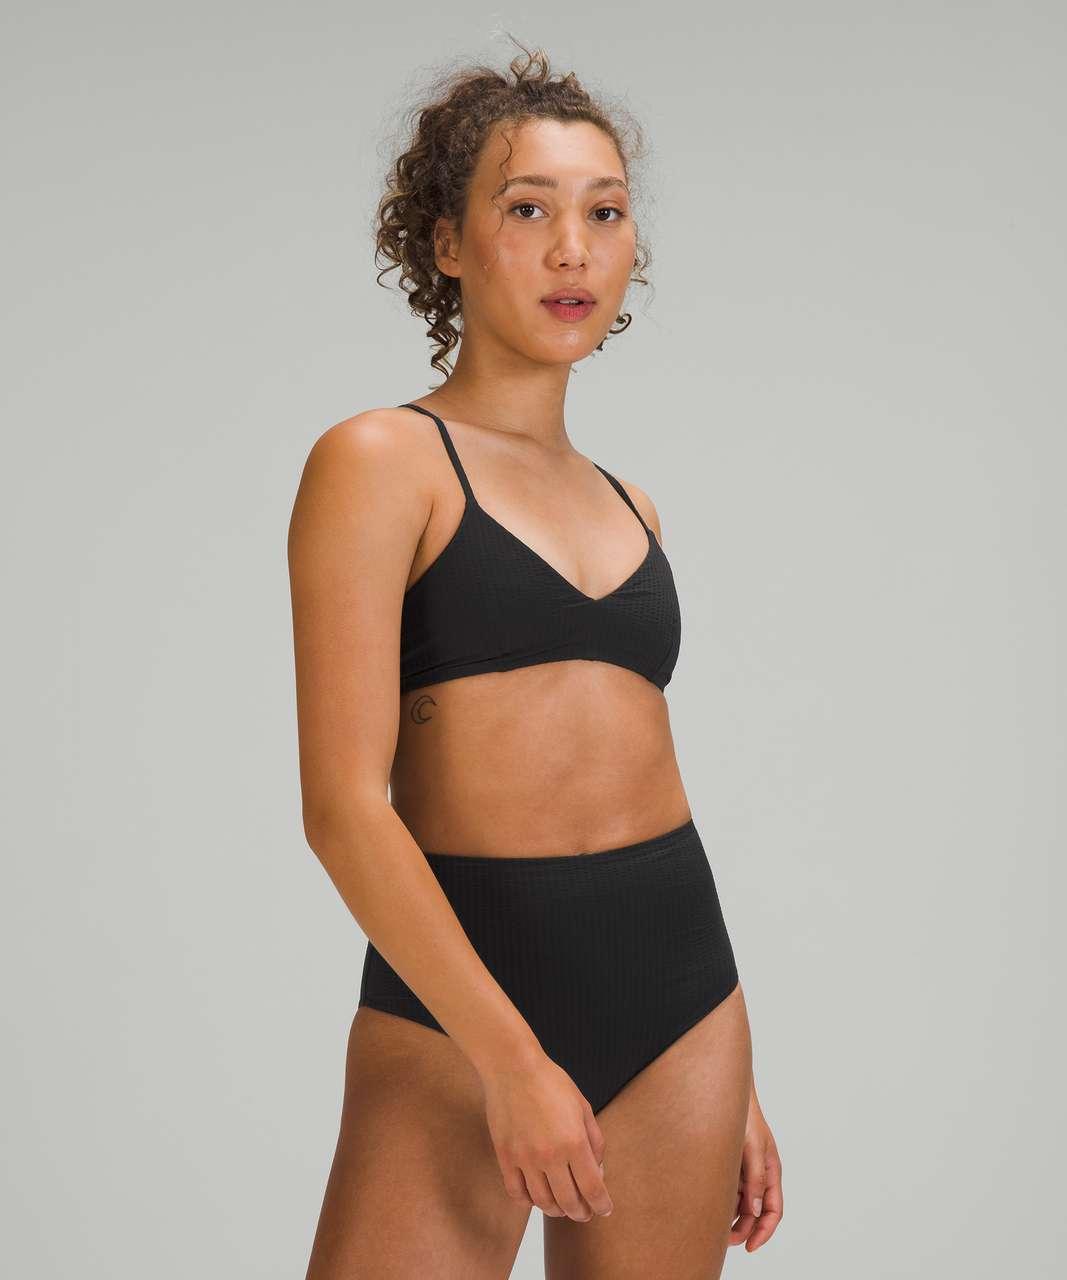 Lululemon Seersucker Triangle Swim Top *A/B Cups - Black